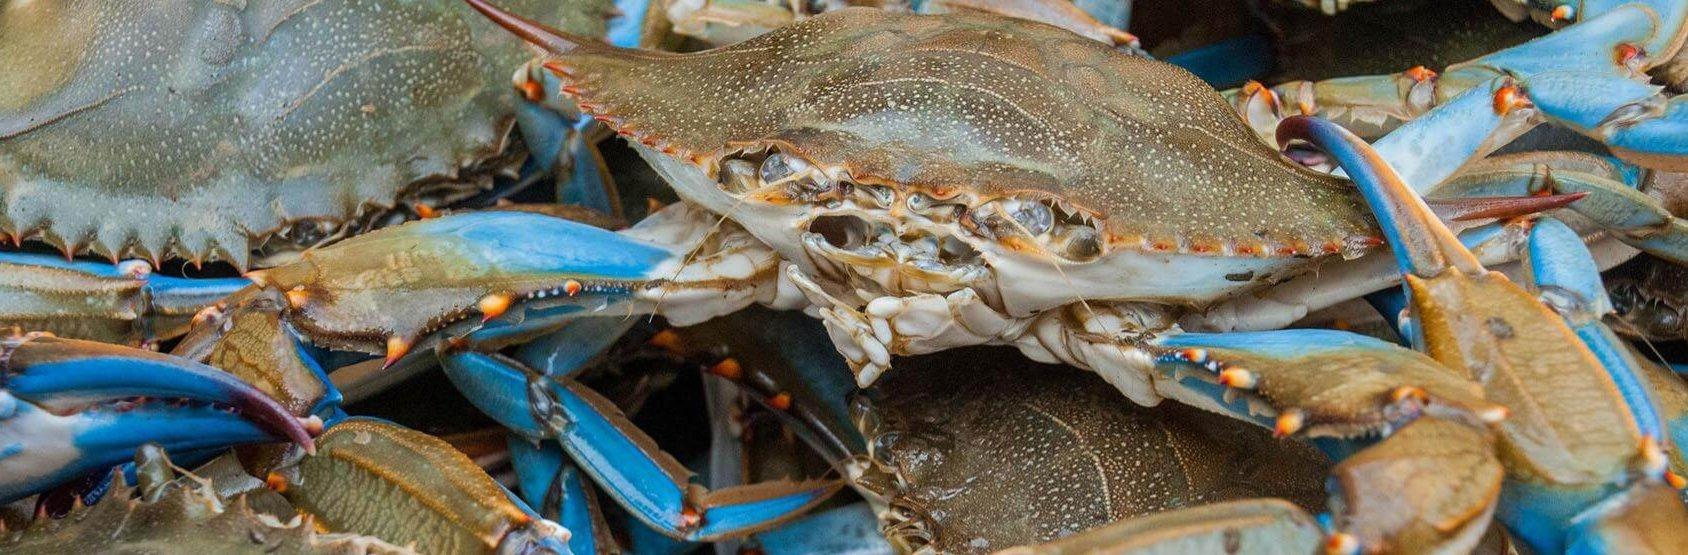 blue-crab_2_edited.jpg